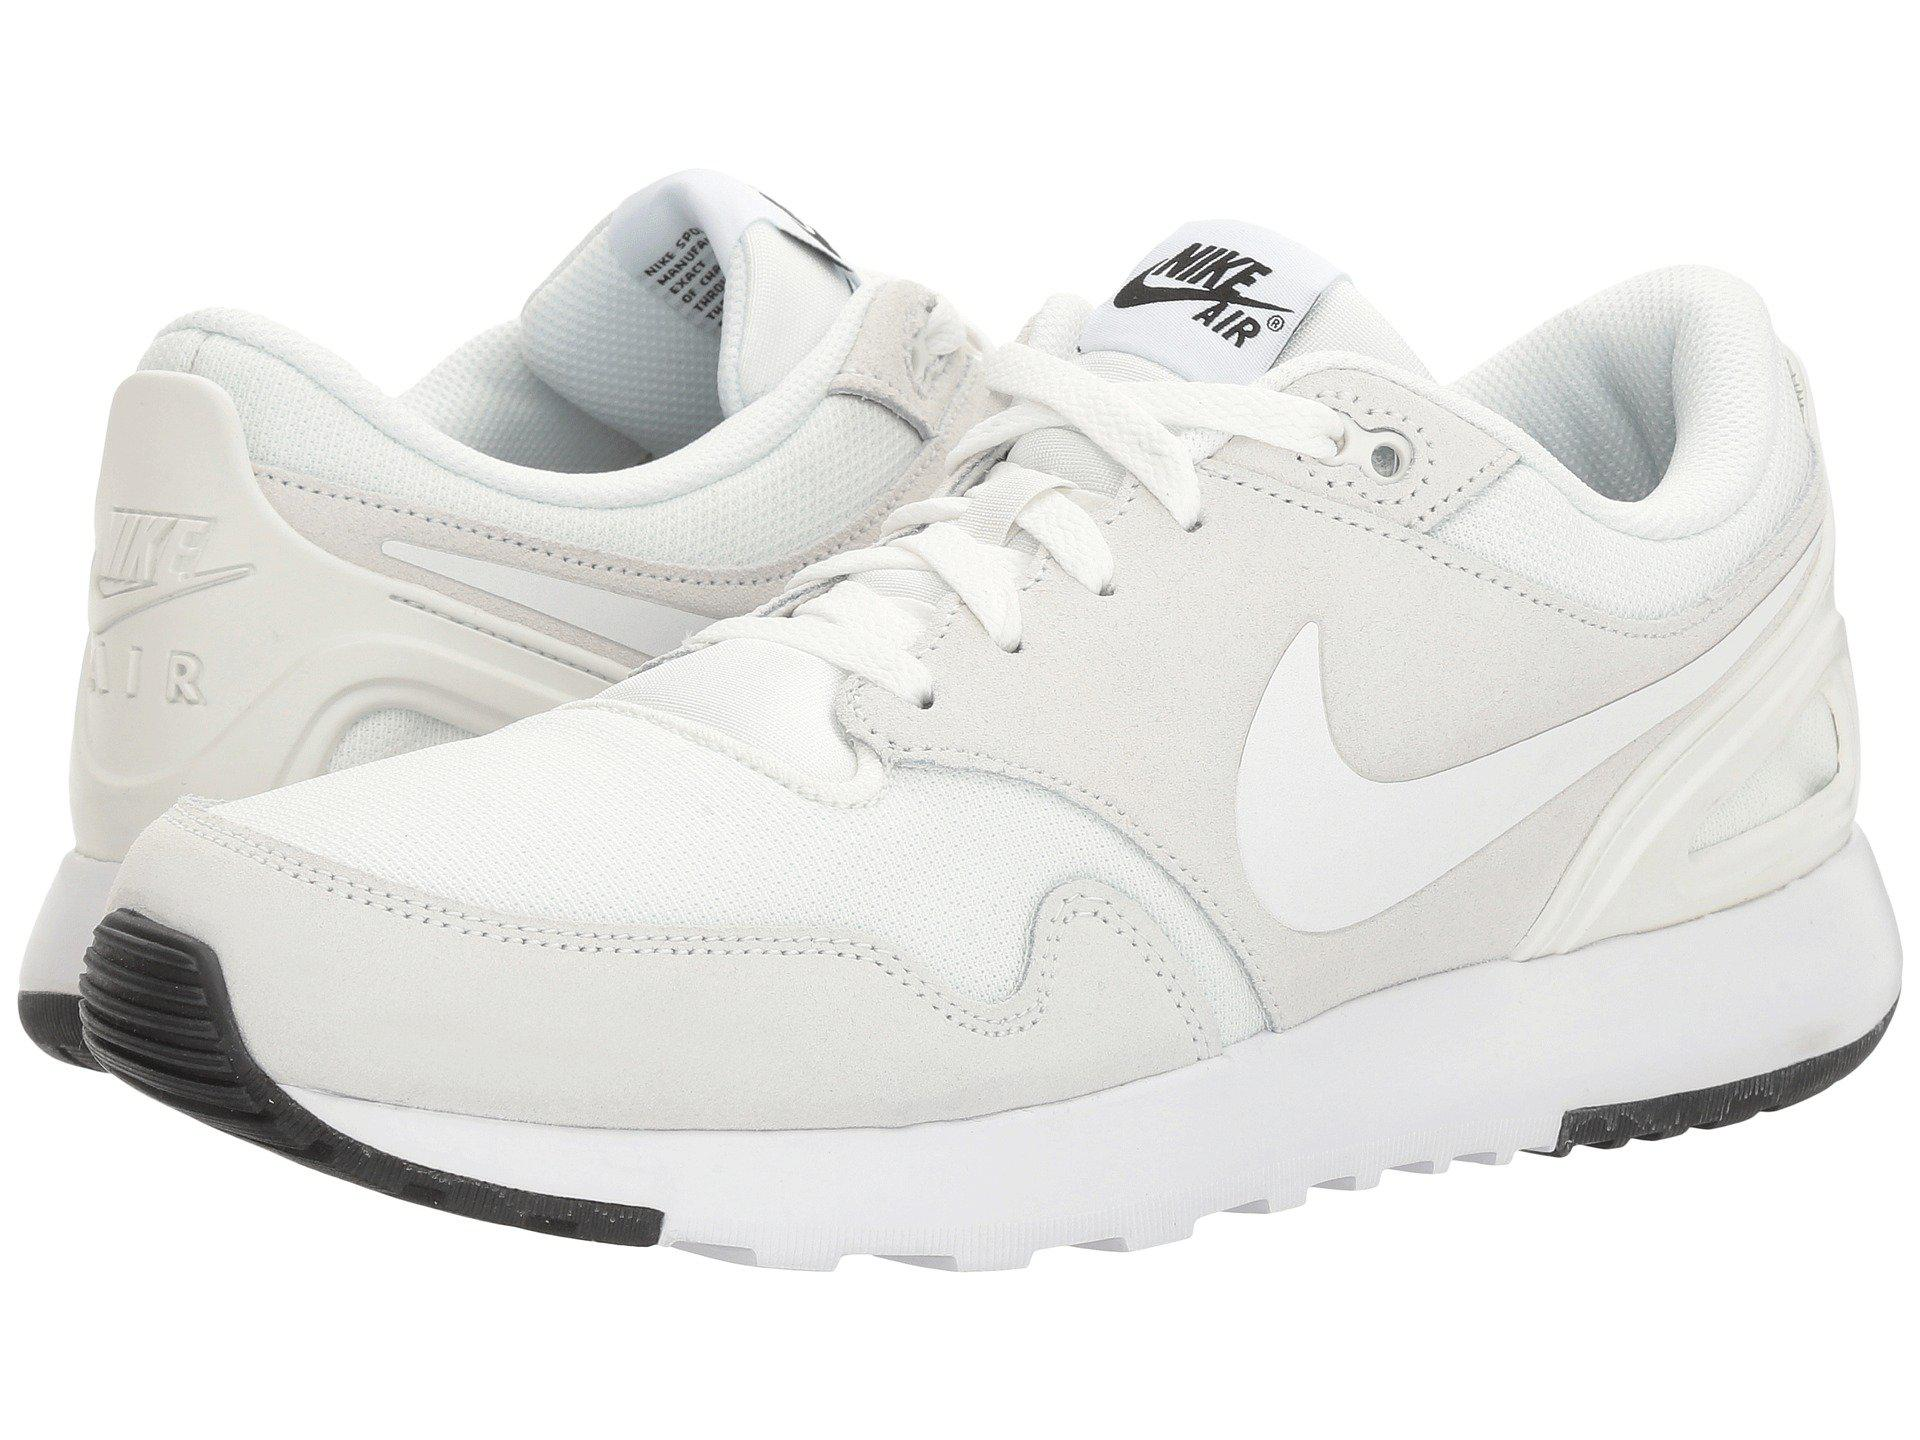 4db4633be9b Lyst - Nike Air Vibenna in White for Men - Save 37%